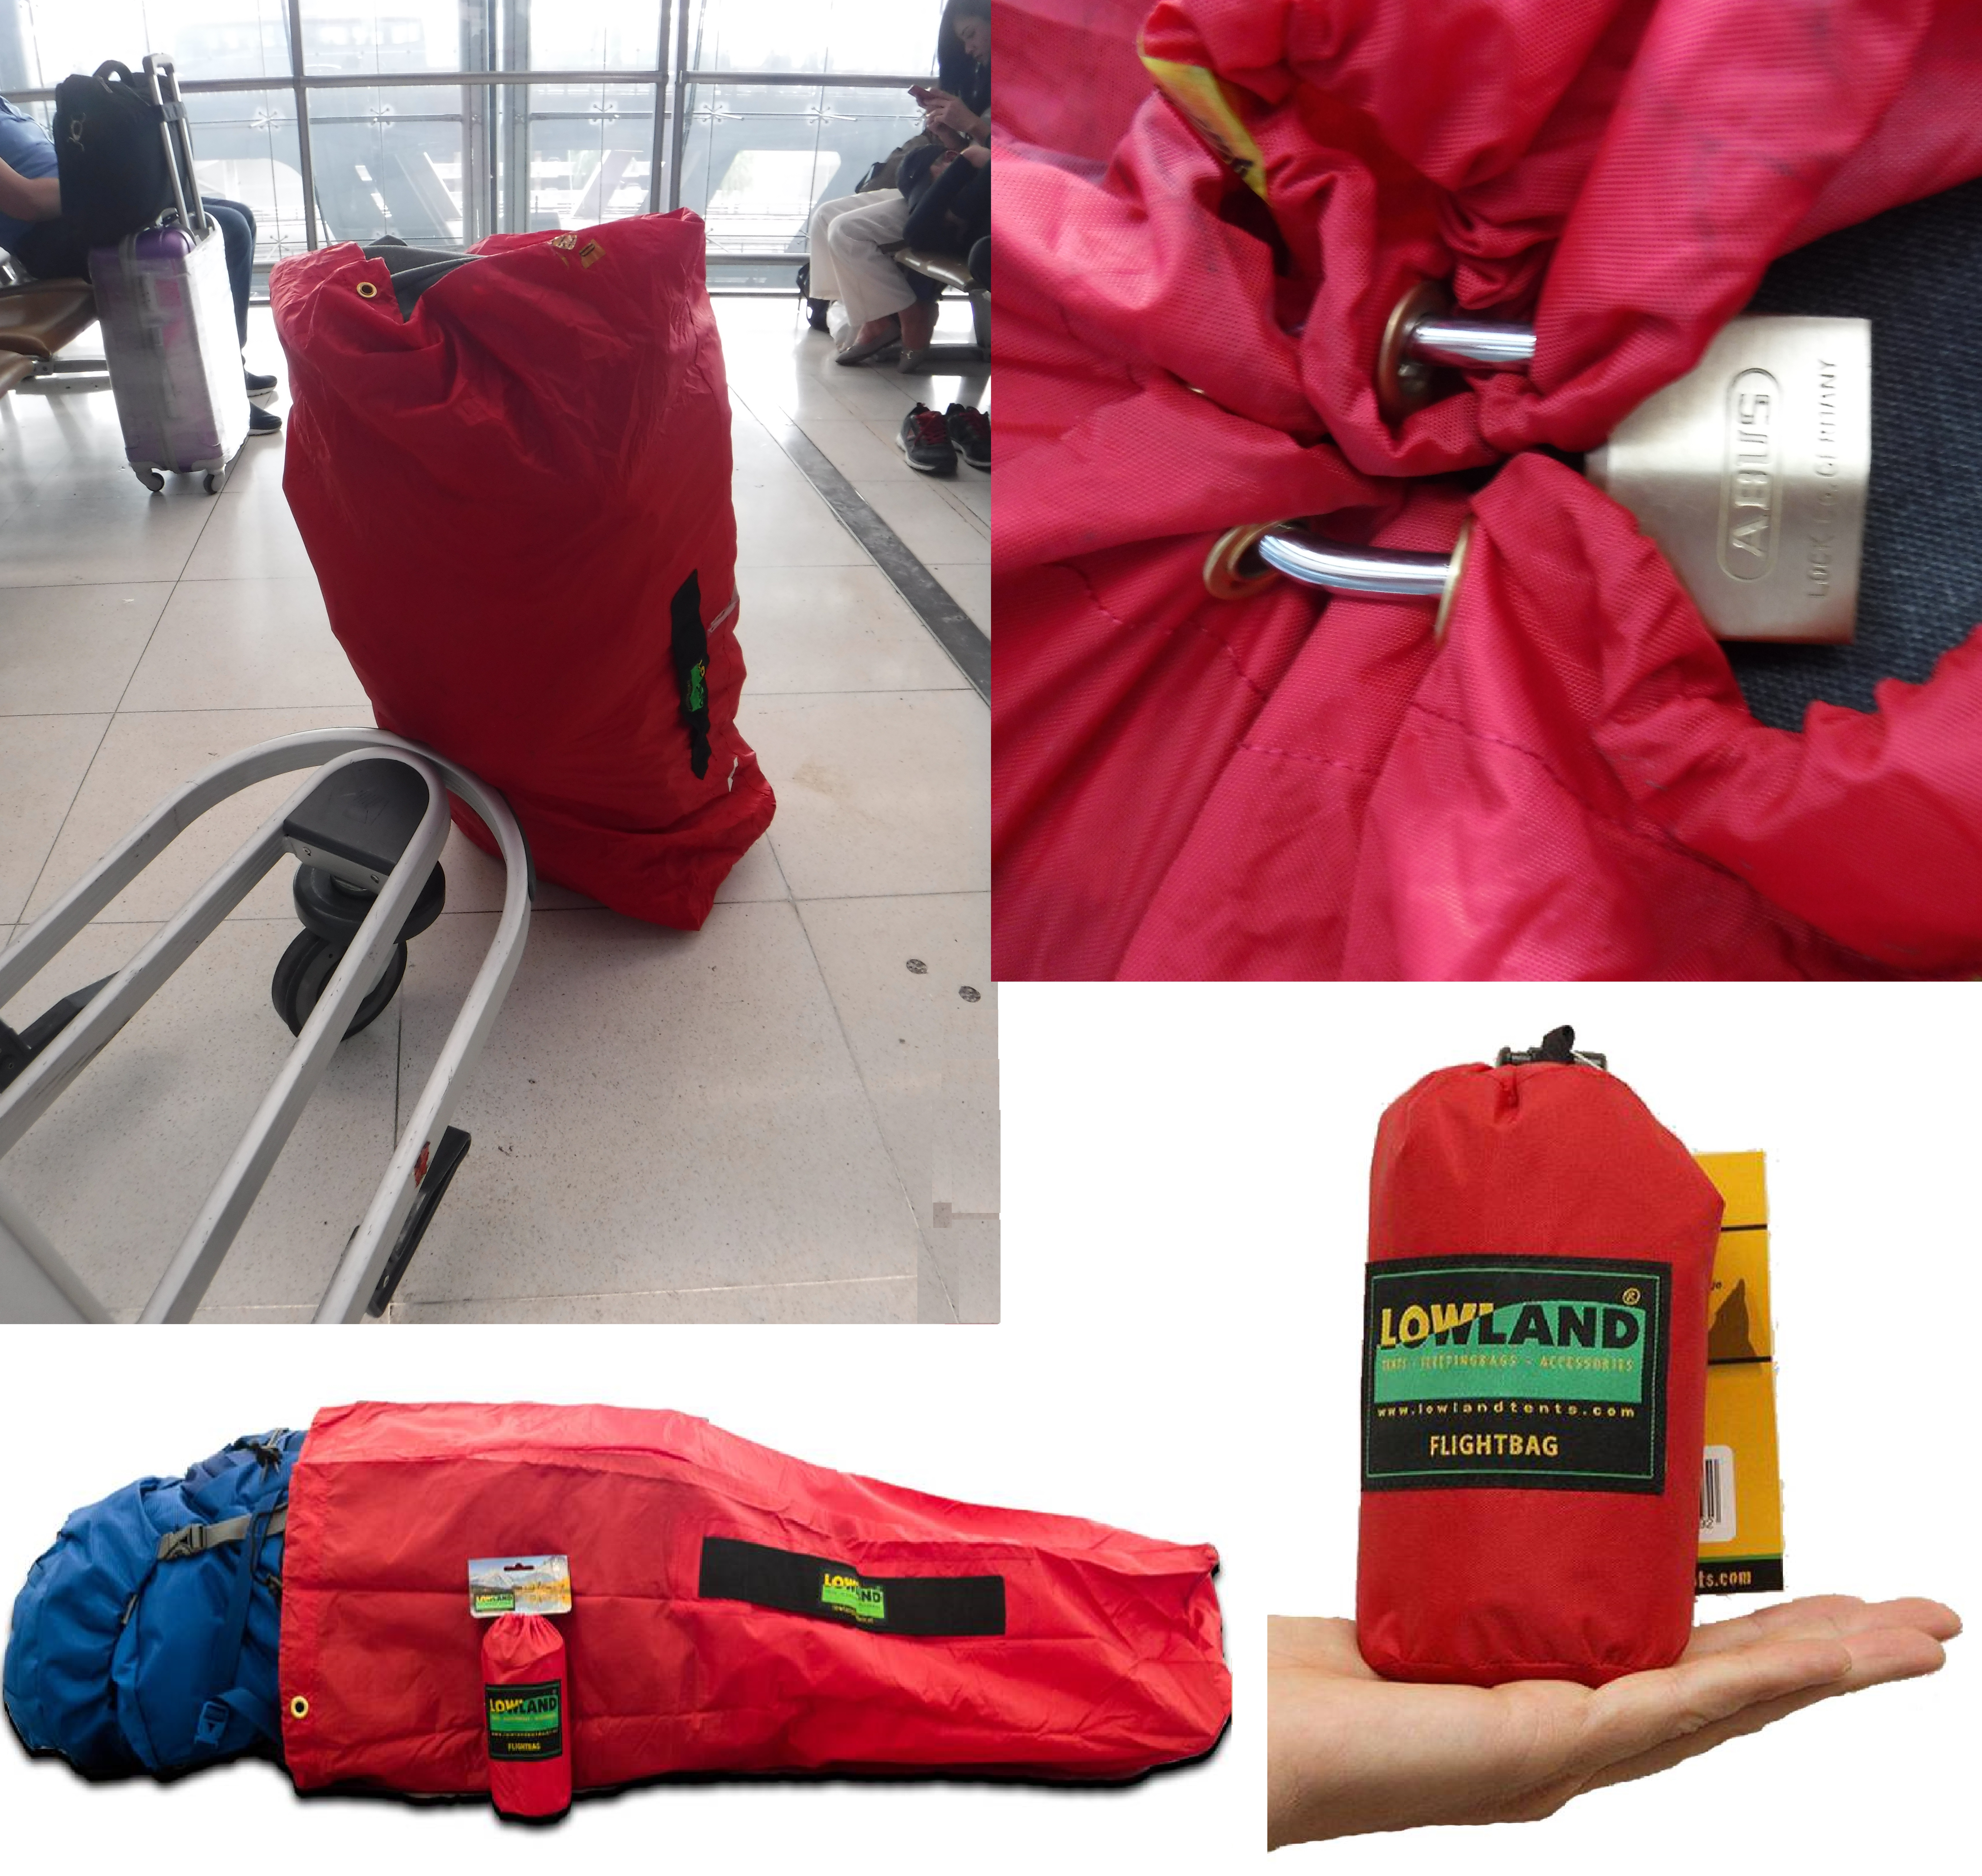 Lowland Outdoor Flightbag compilation